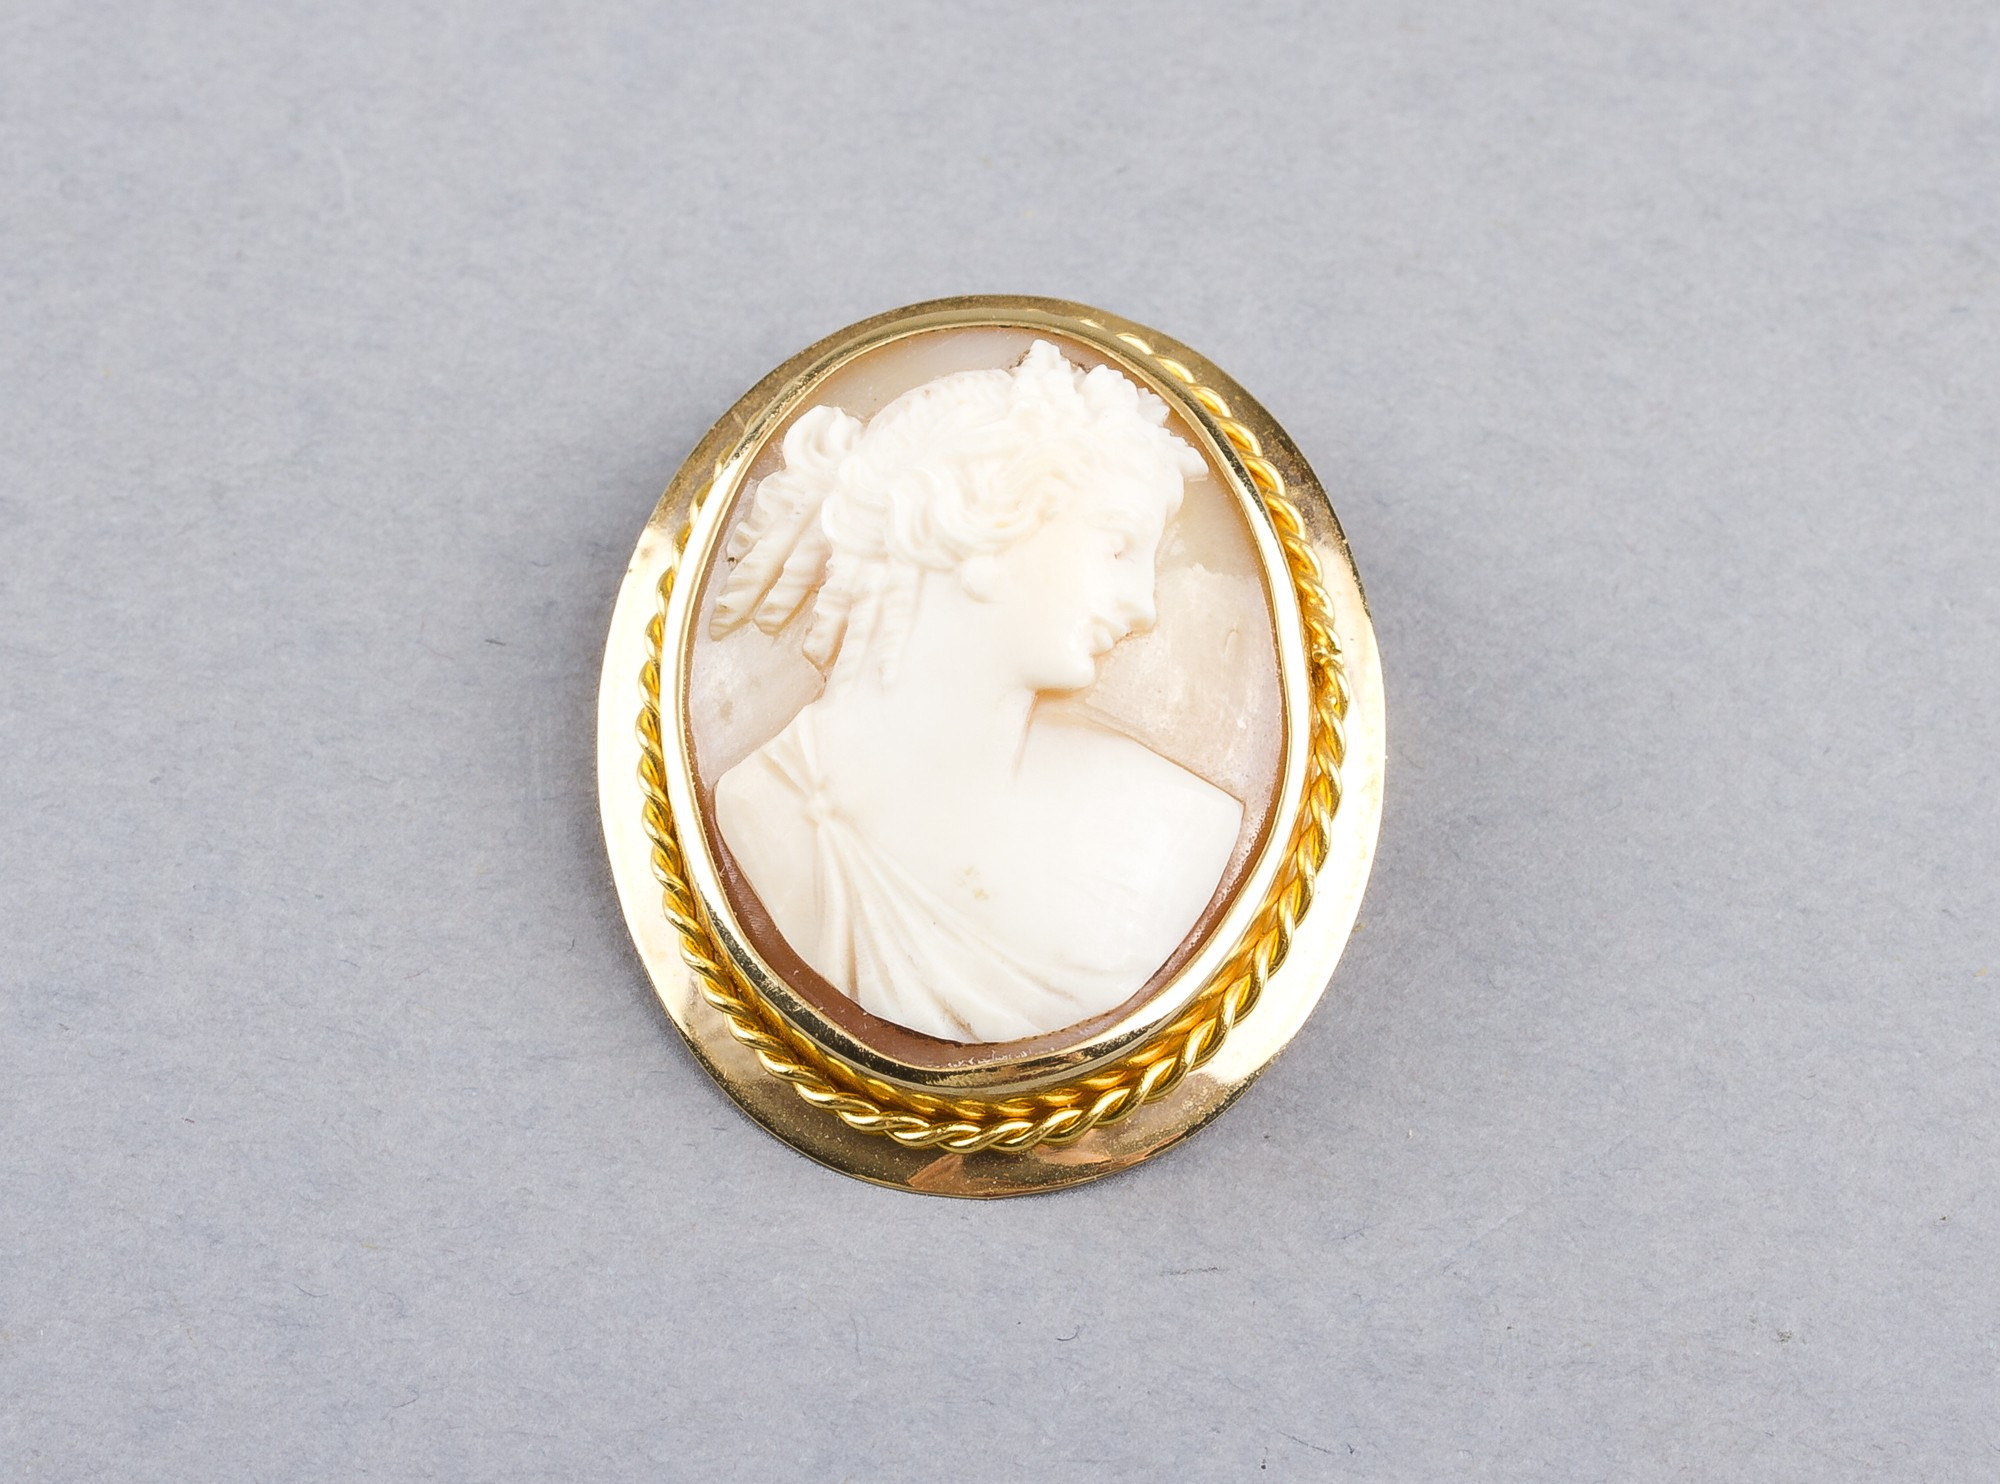 Camee brooch